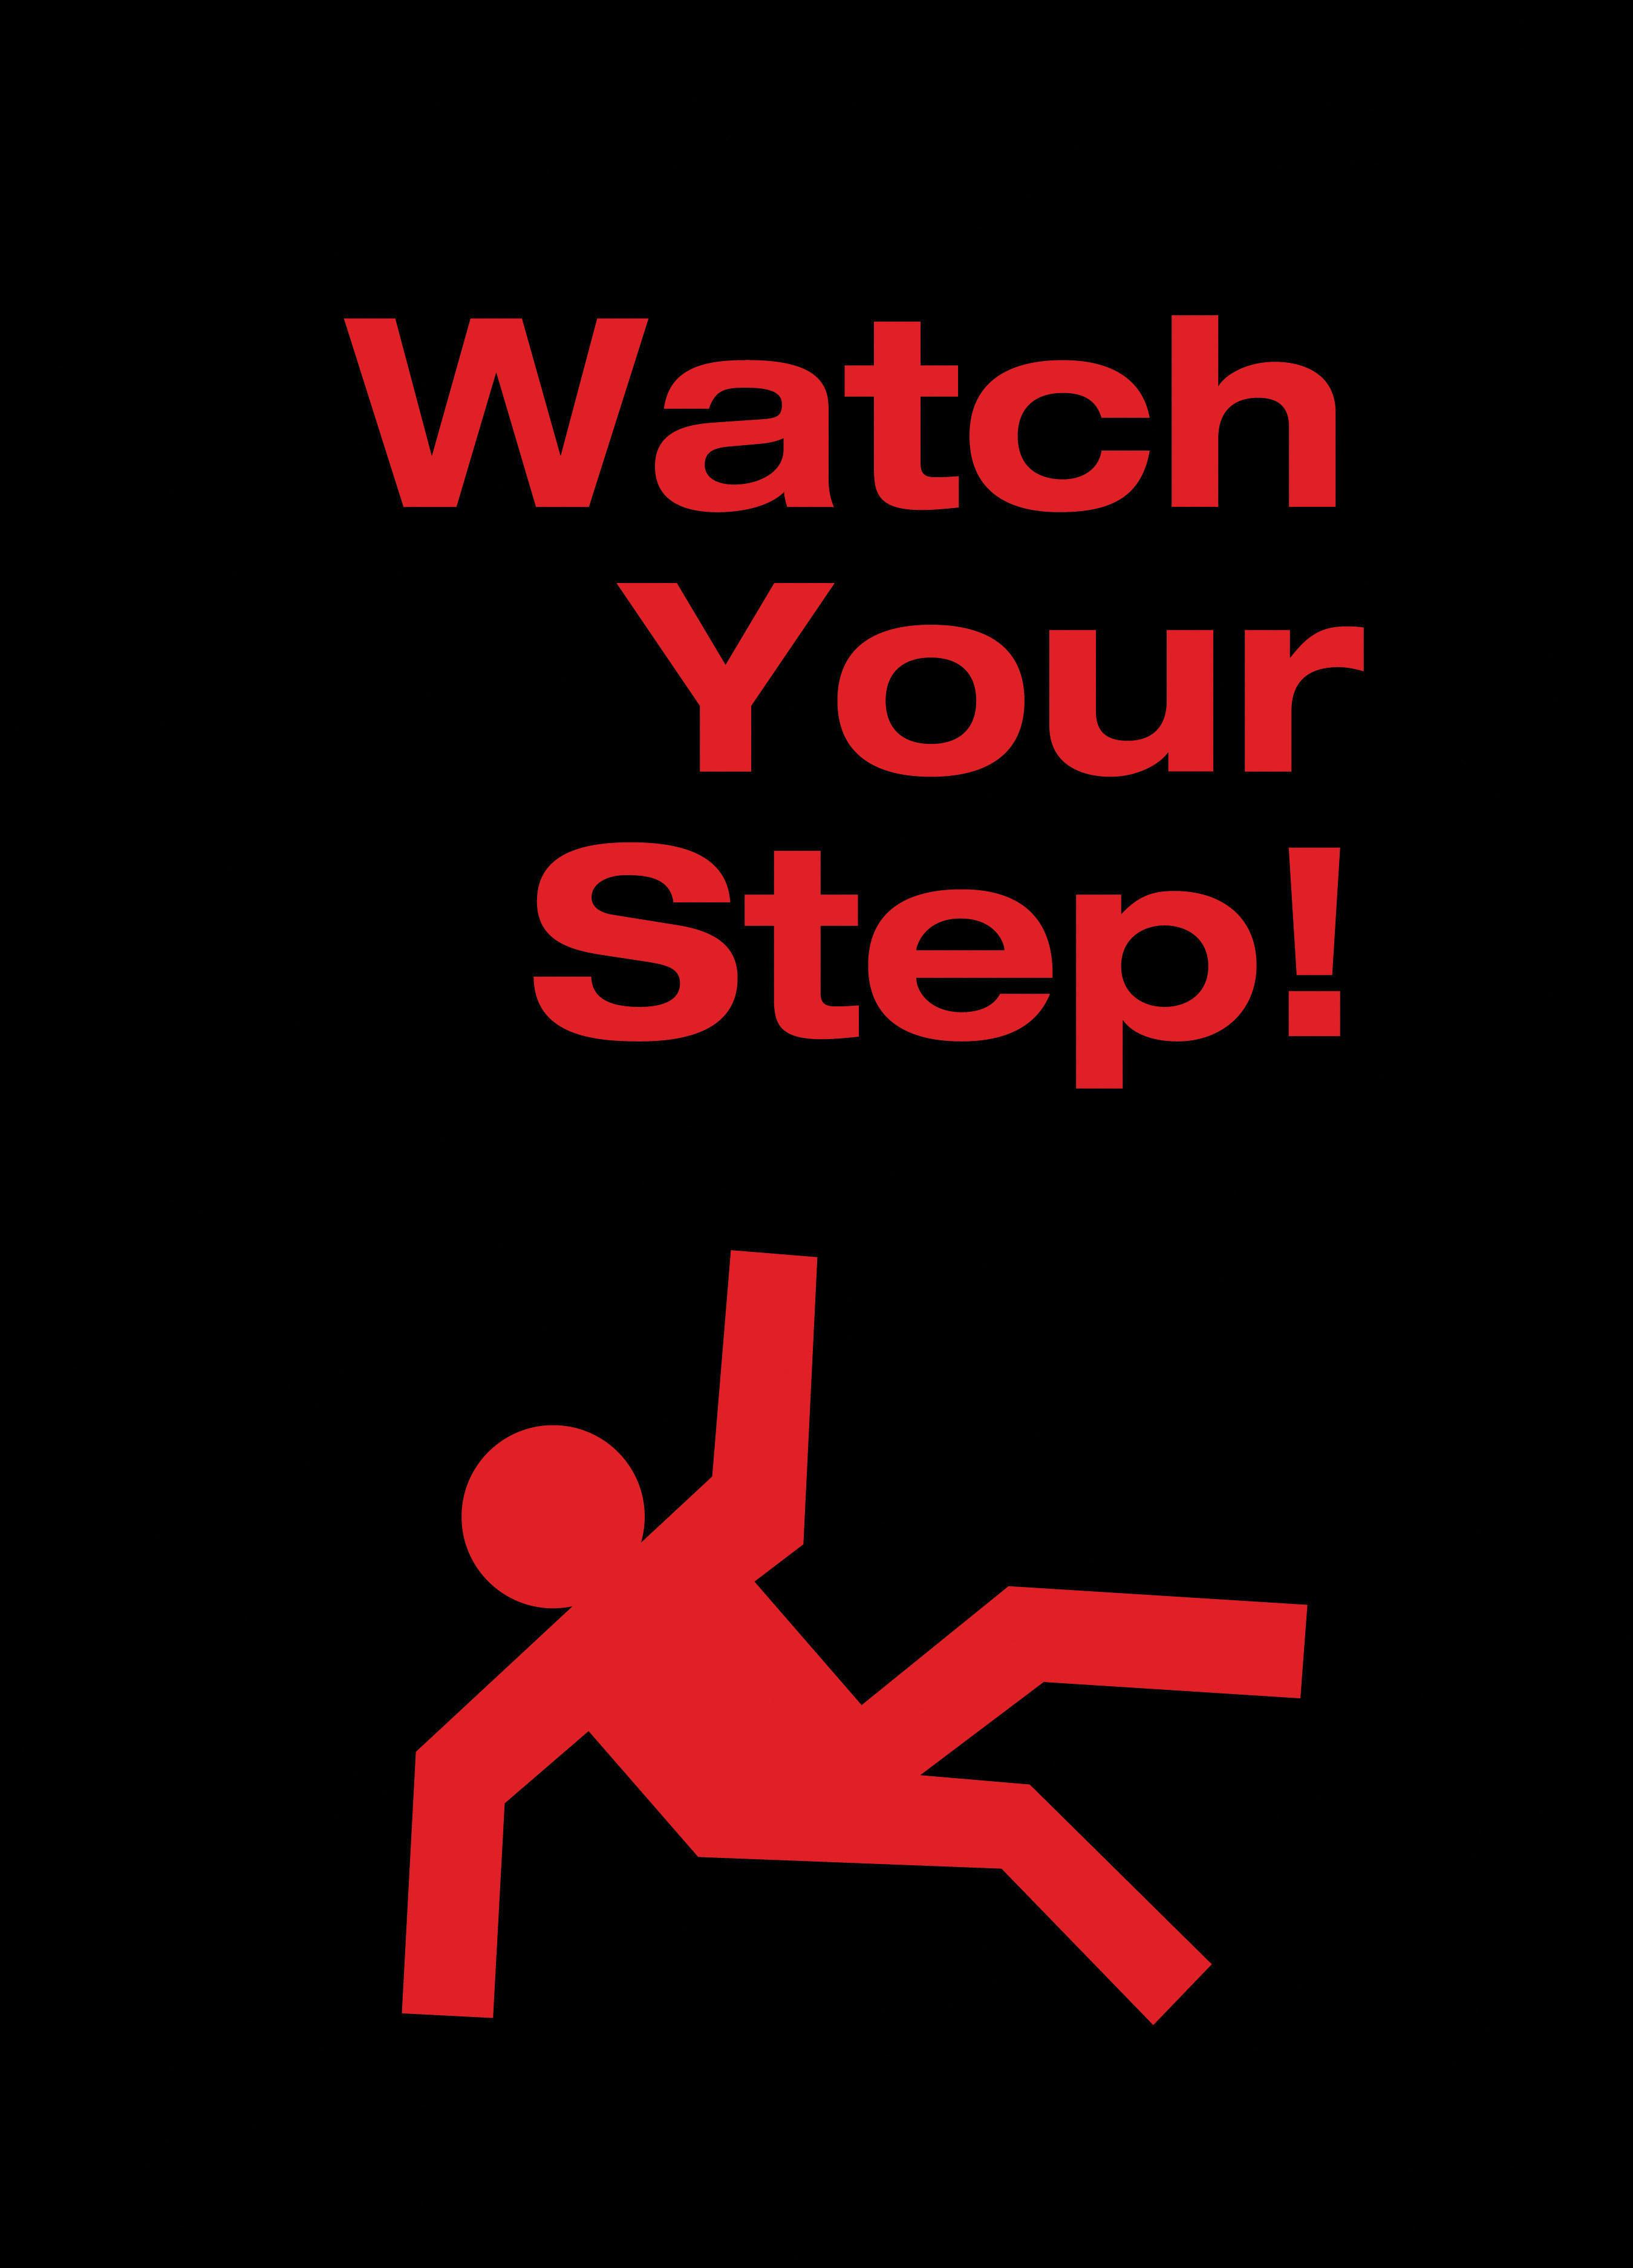 Safety Message Floor Mat Watch Your Step Floormatshop